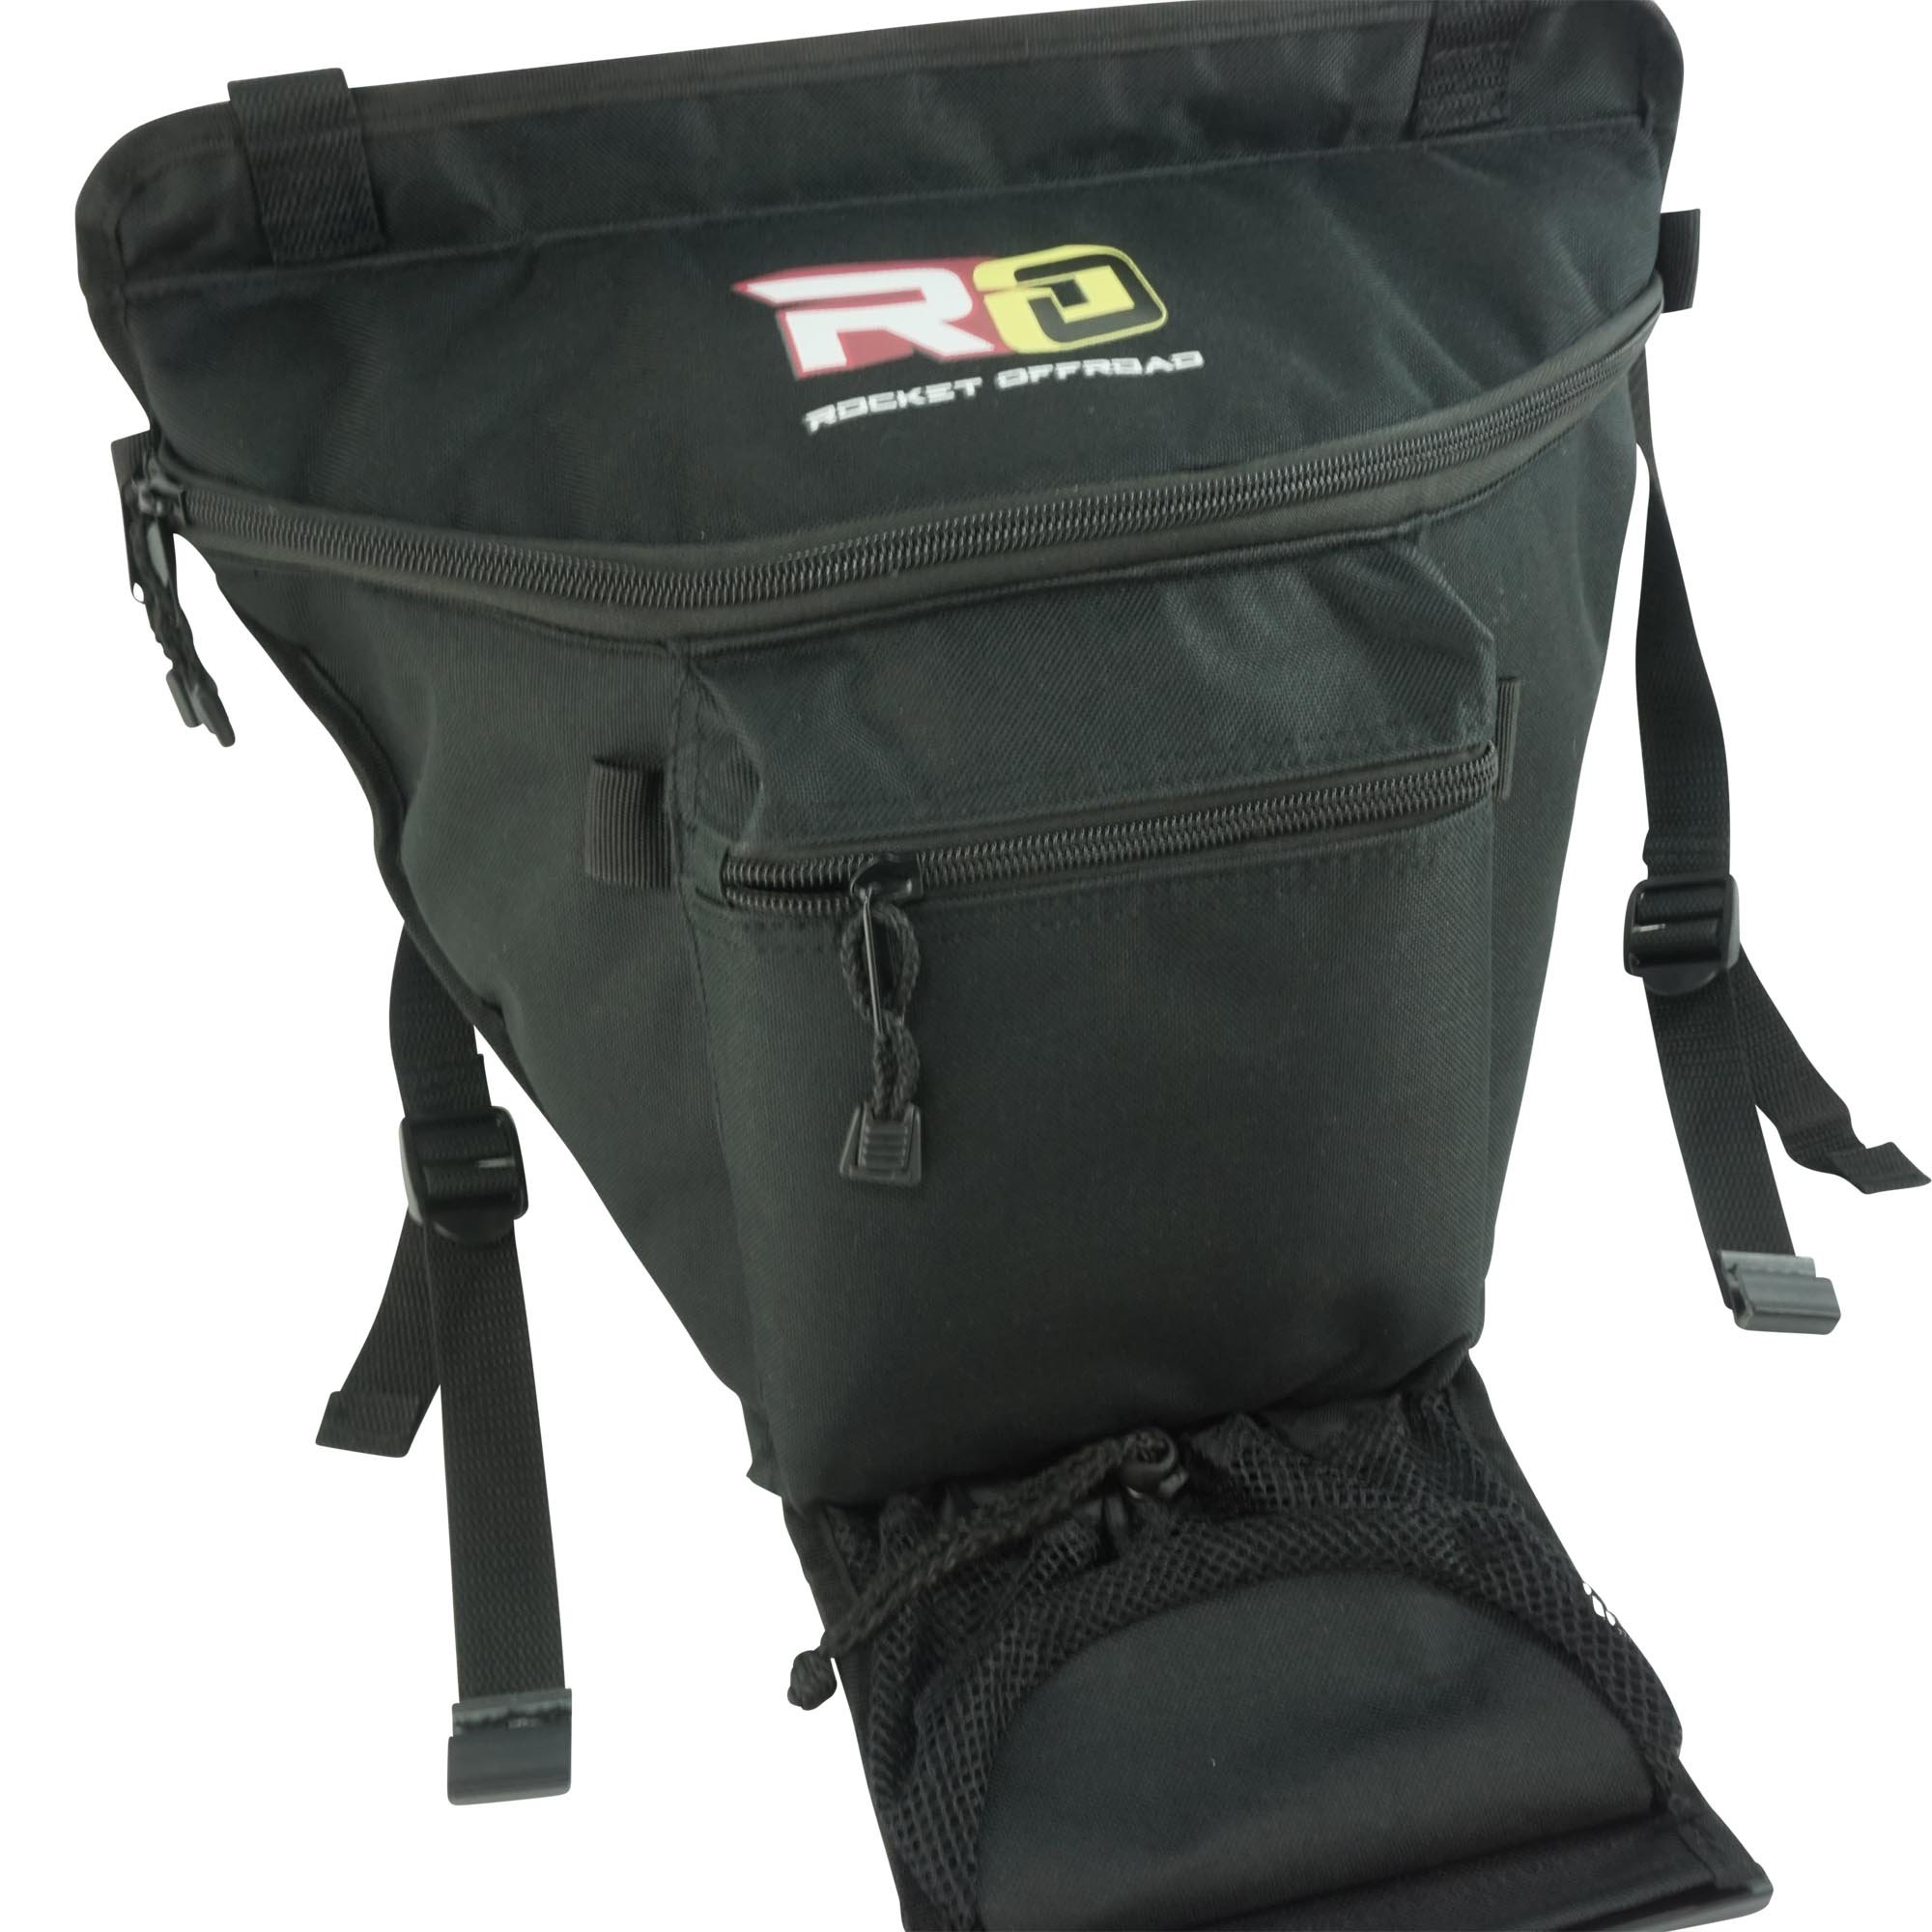 Rocket Offroad RO-UTV-SB Black UTV Cab Pack for RZR